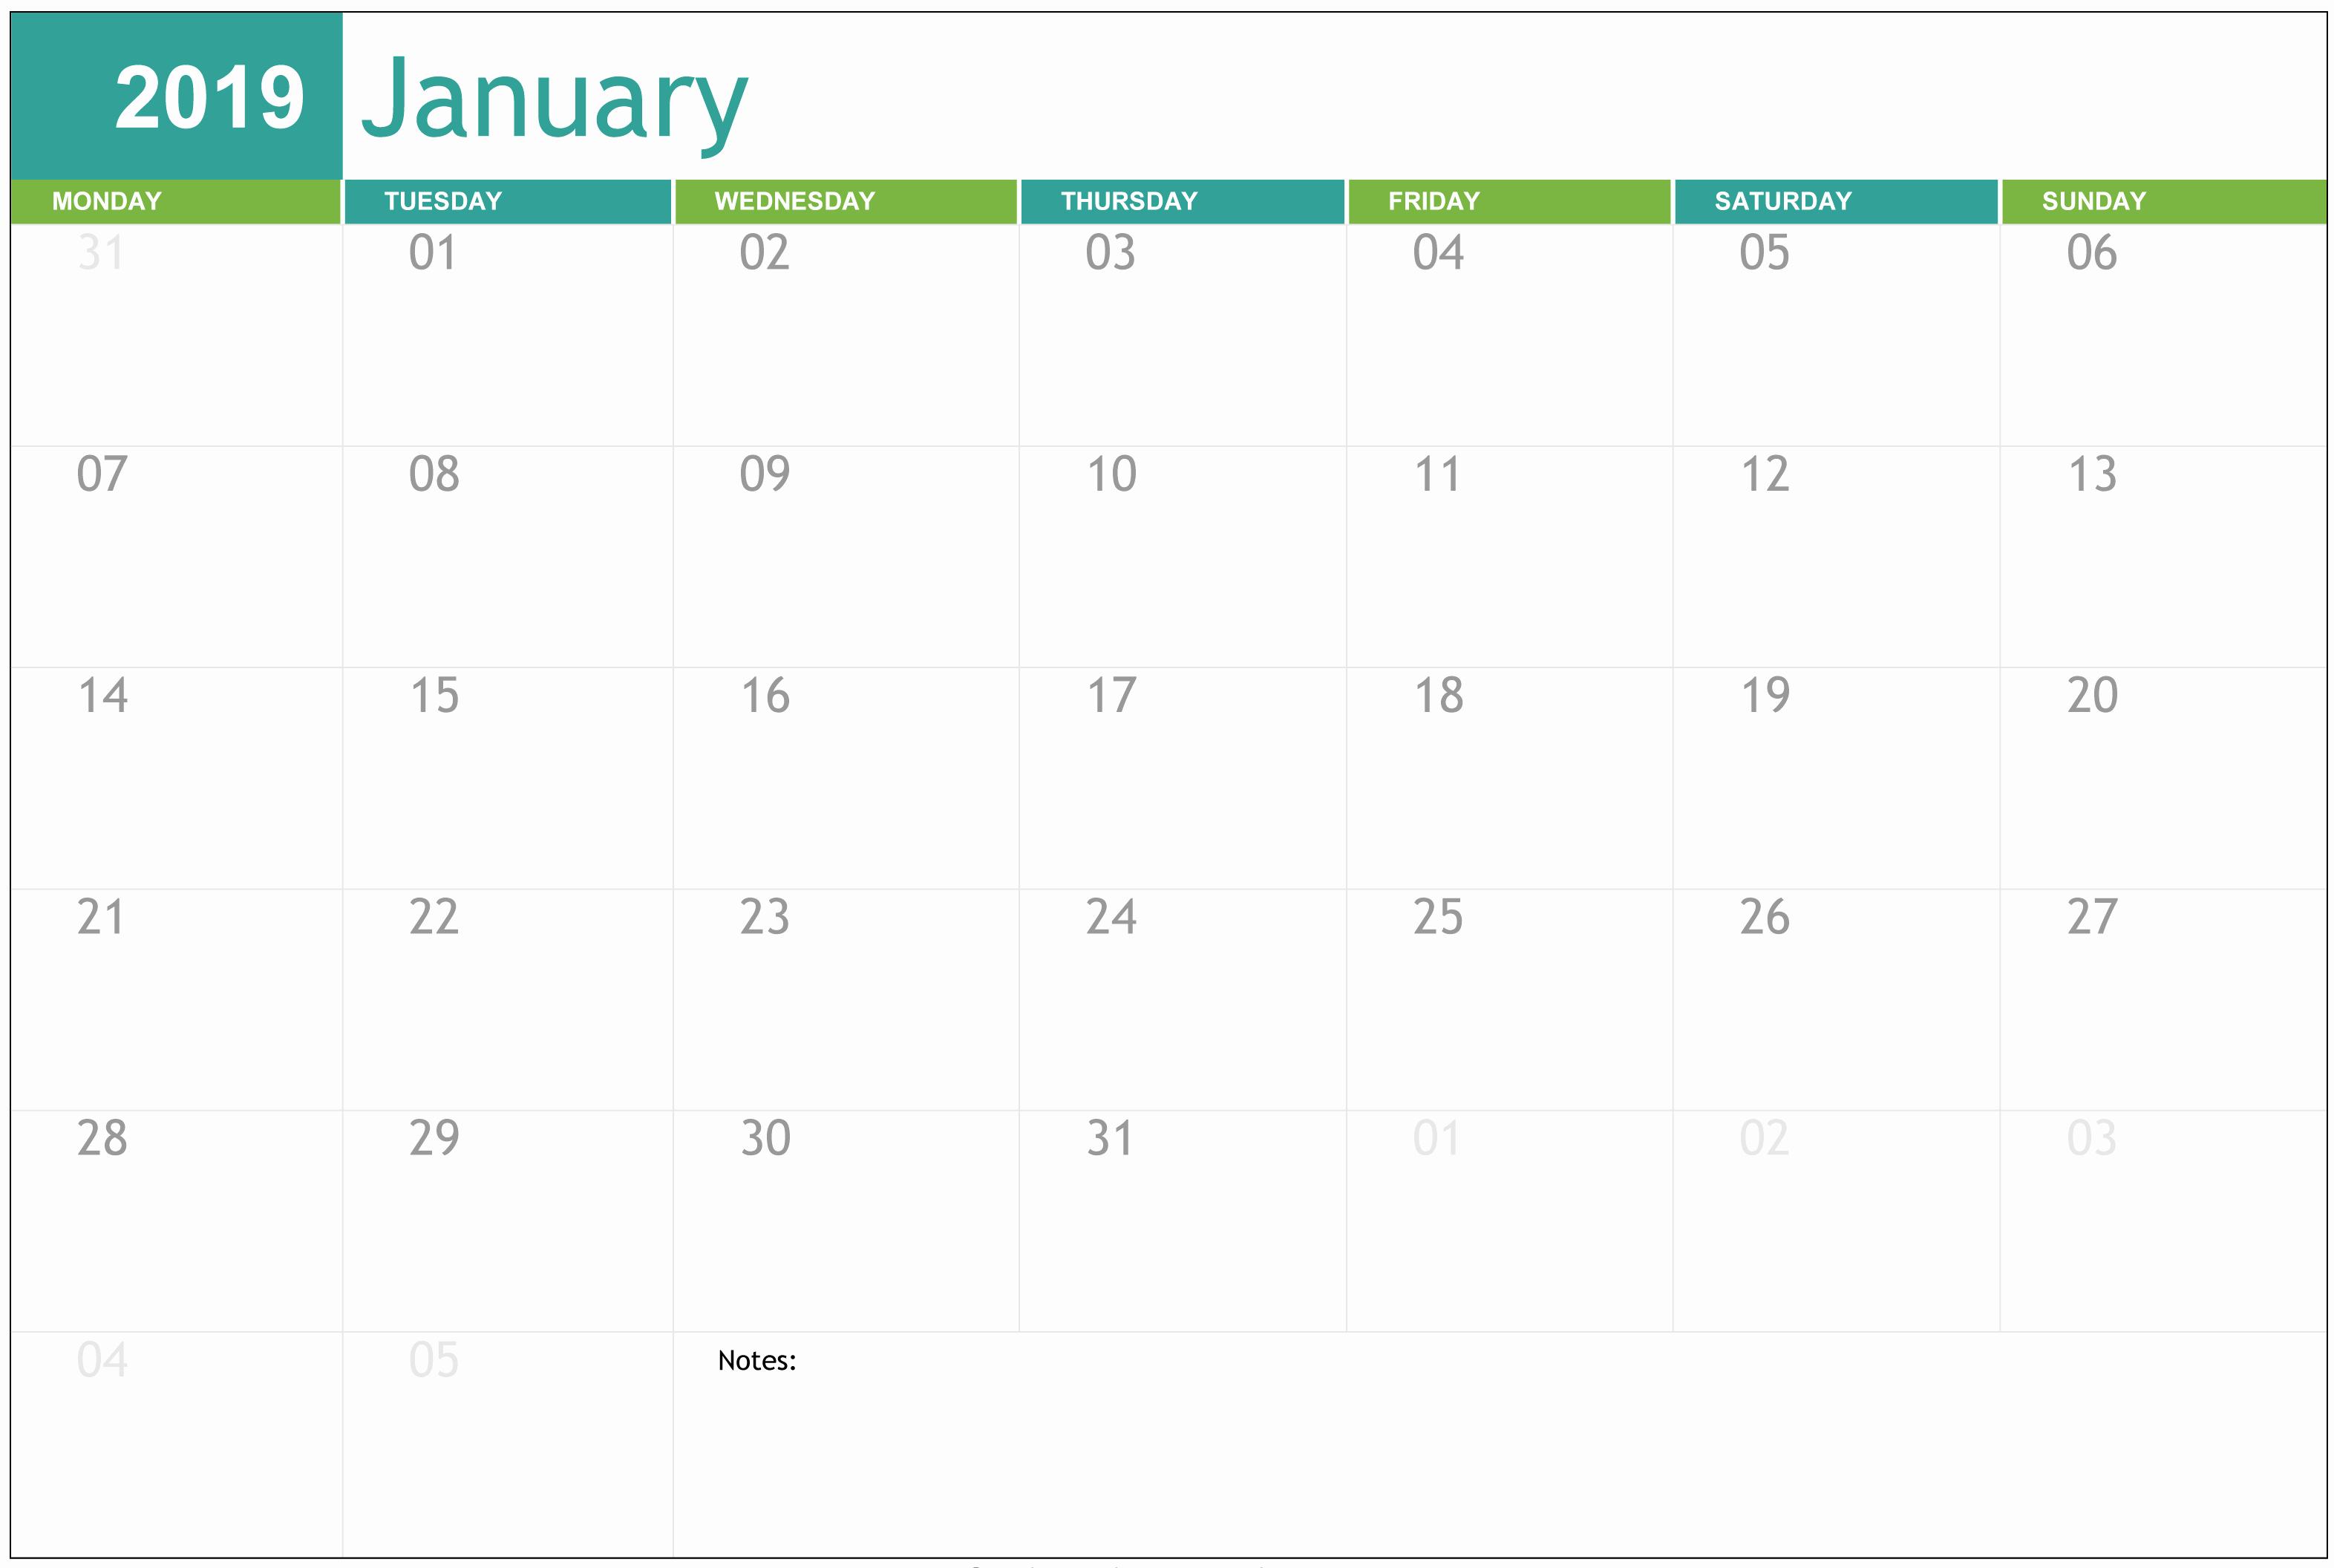 Free Printable Editable Calendar Unique Editable January 2019 Calendar Printable Template